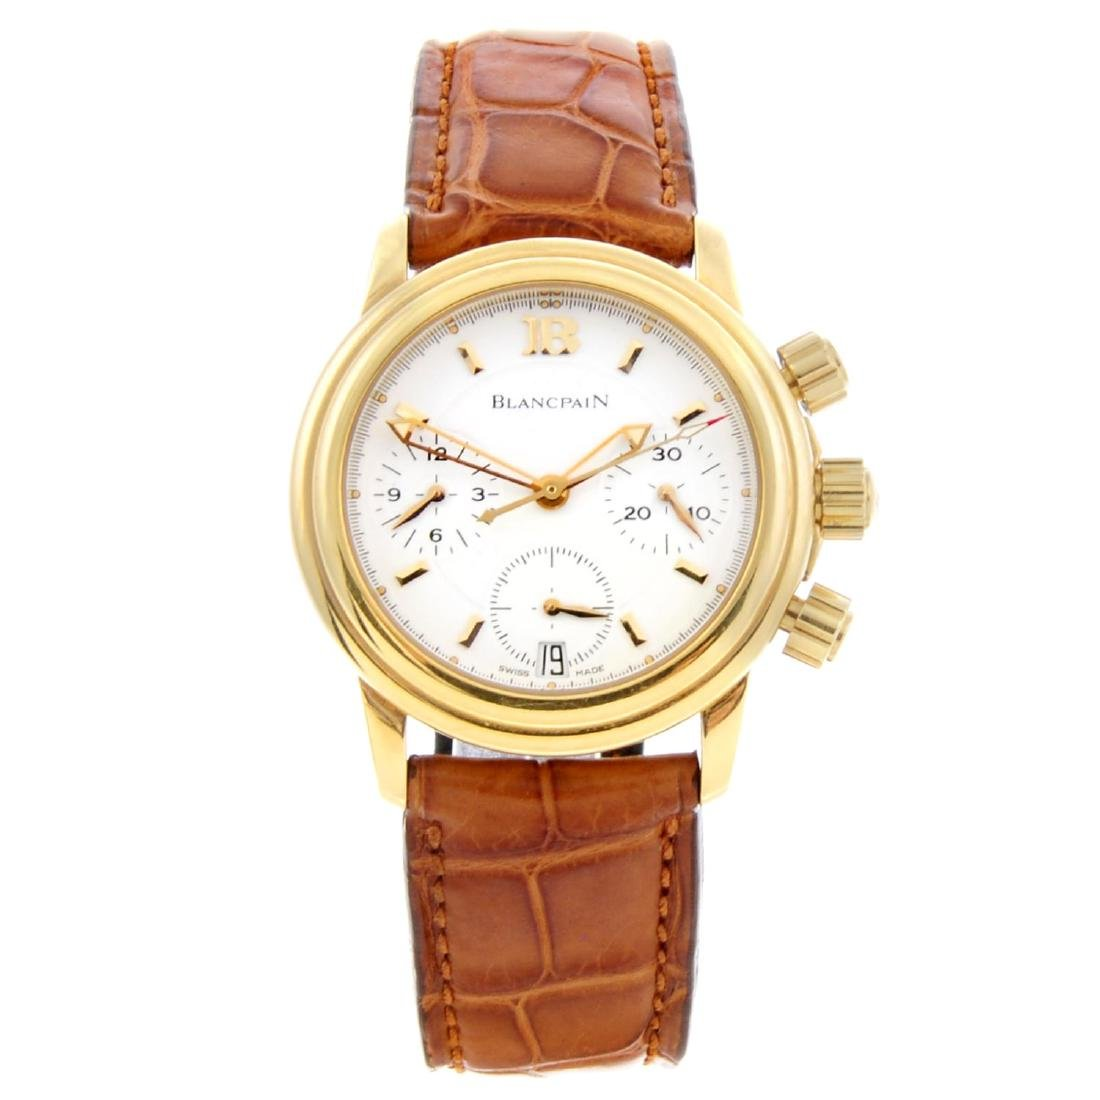 BLANCPAIN - a mid-size Villeret chronograph wrist